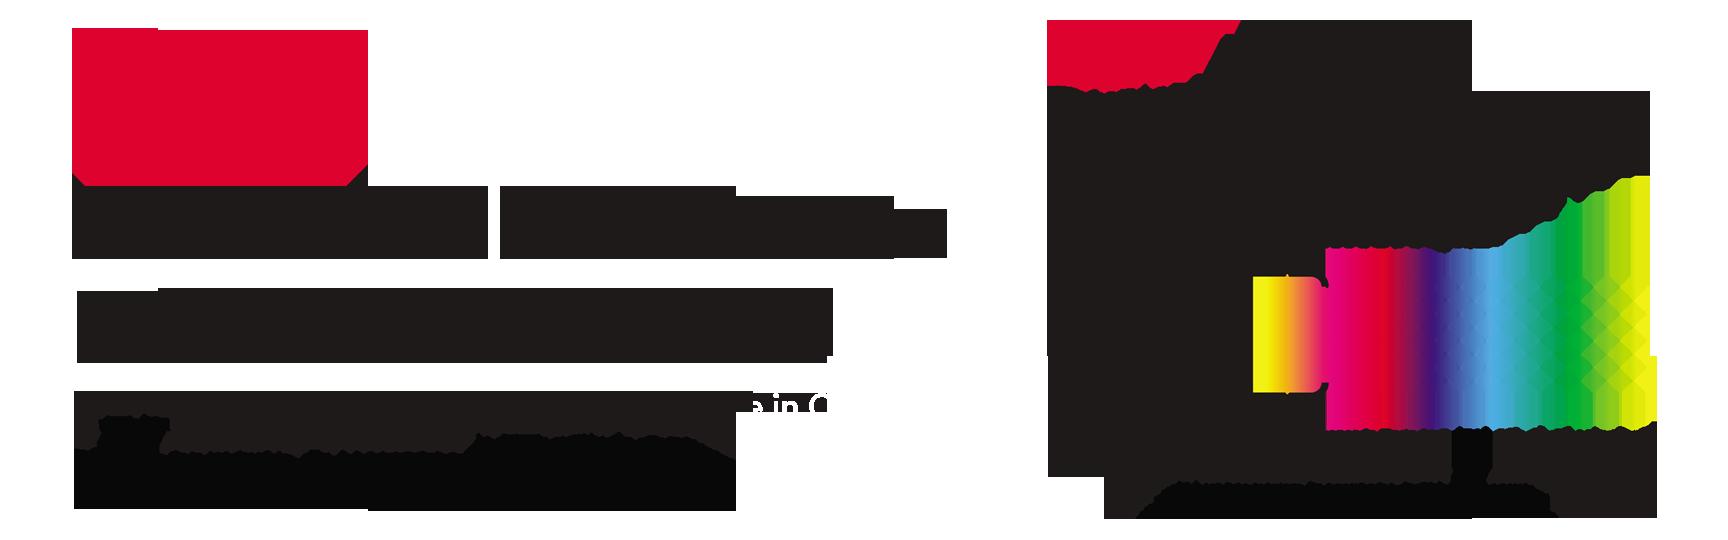 3M Certified Fabricator Certification